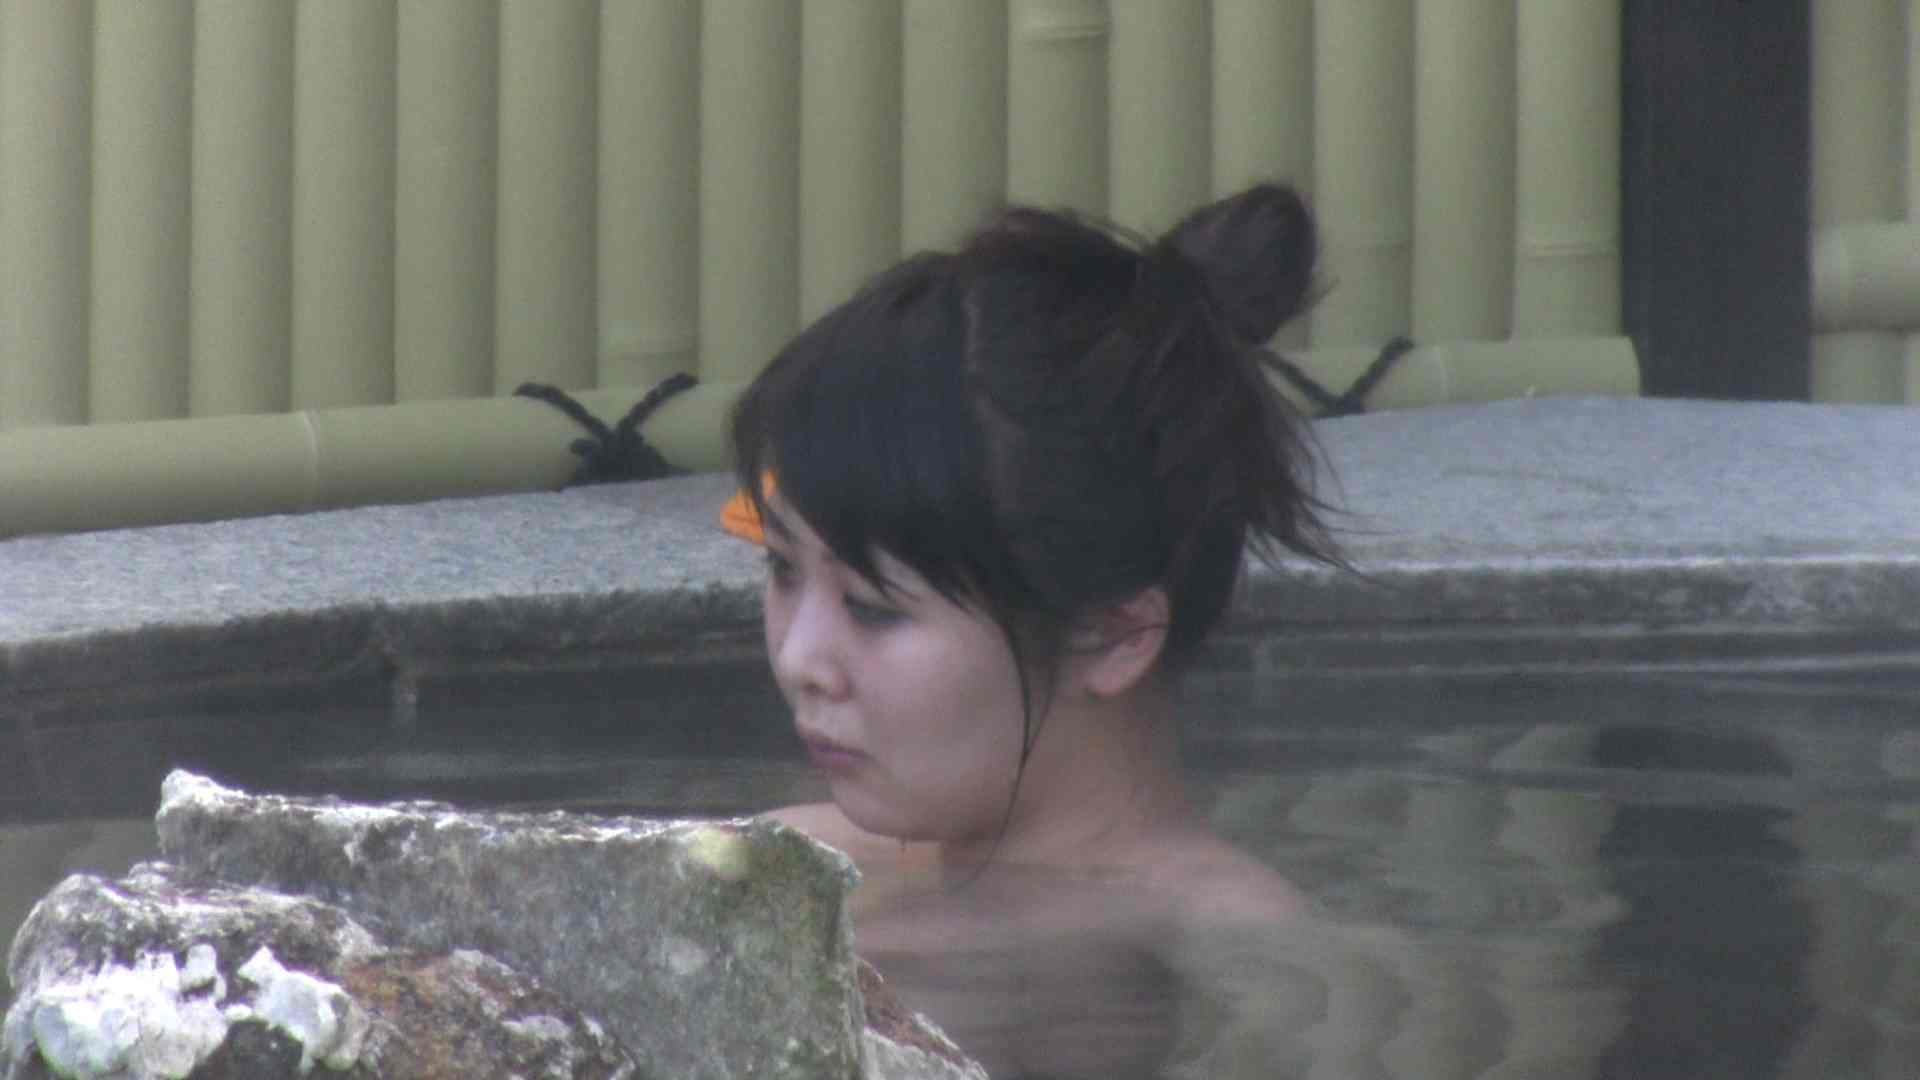 Aquaな露天風呂Vol.118 OL女体  68連発 30